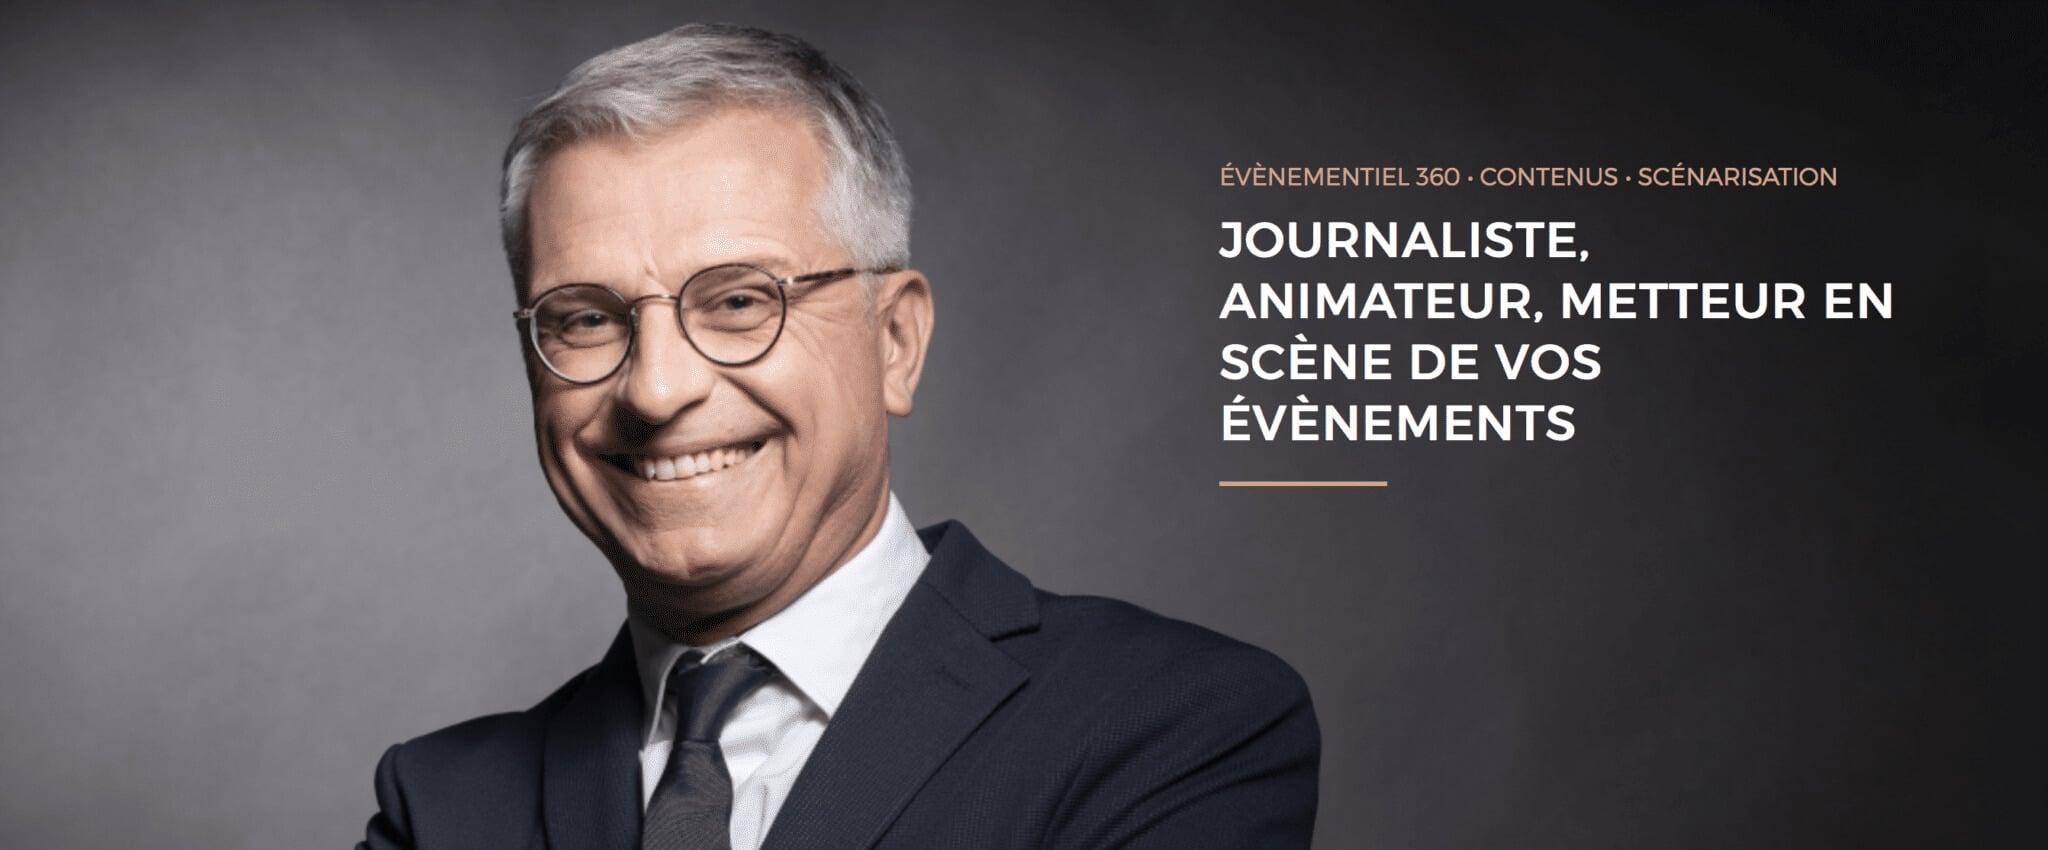 Thierry Cabannes Journaliste